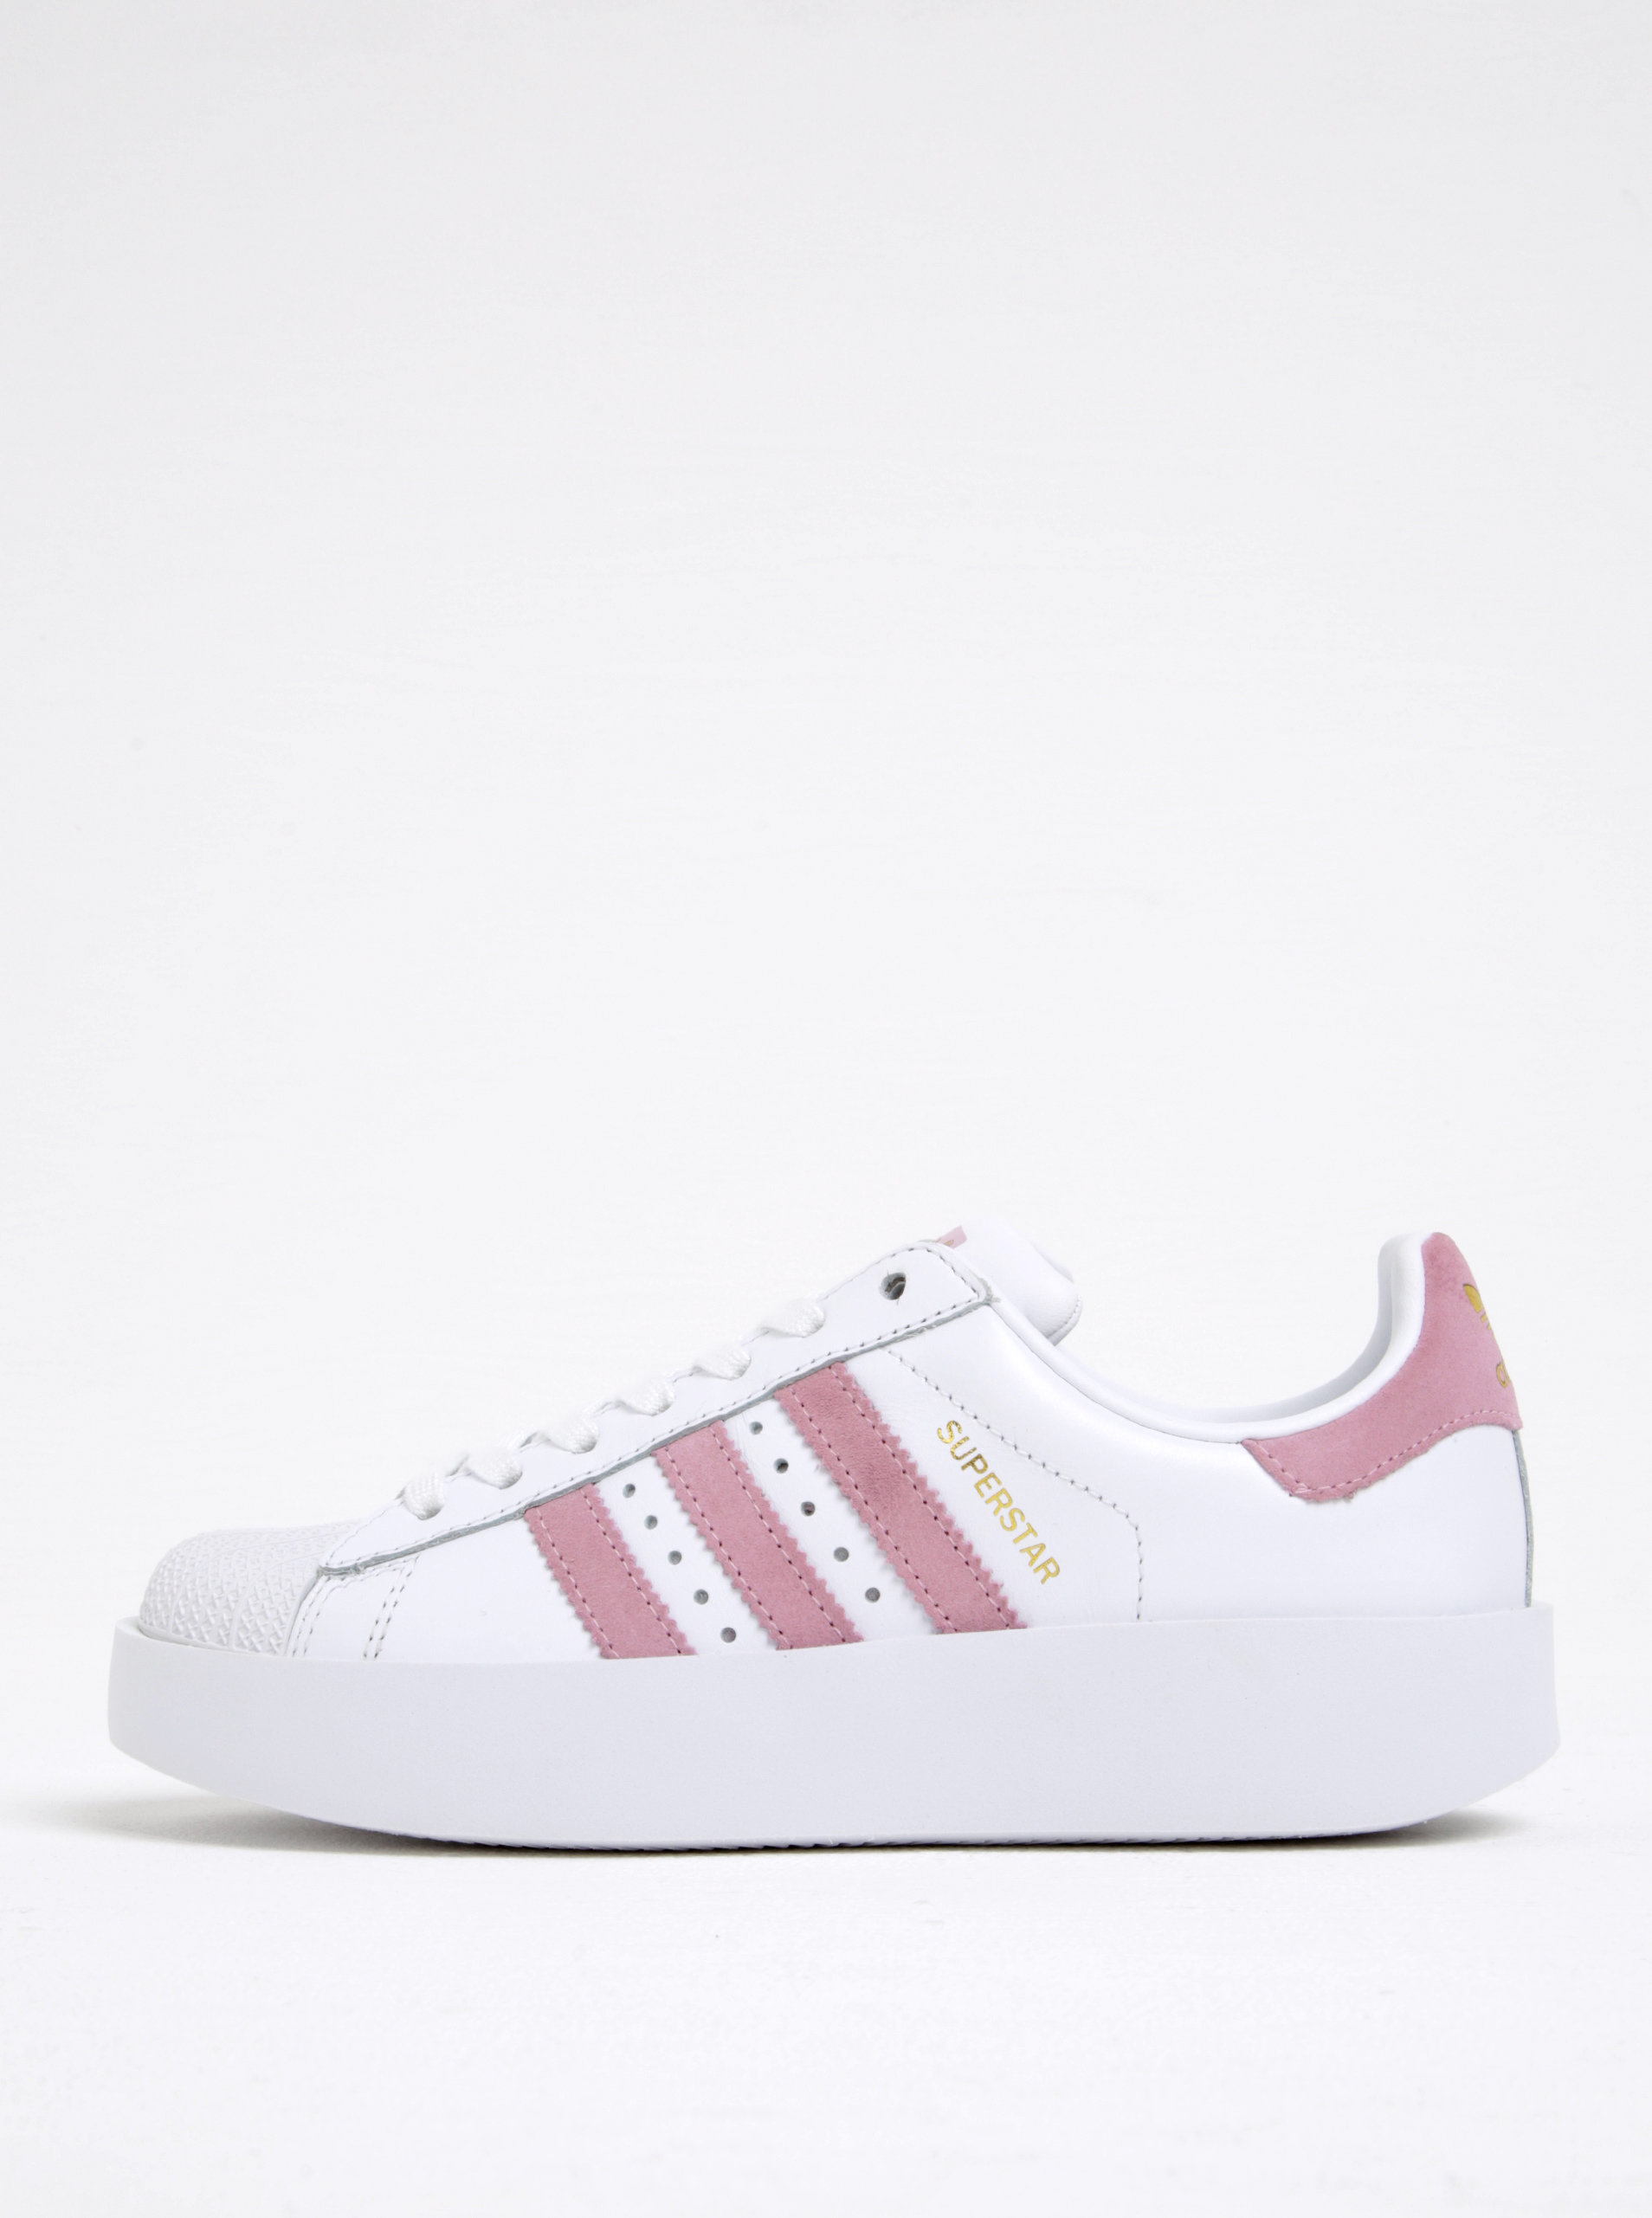 1122ea53aa05 Biele dámske kožené tenisky na platforme adidas Originals ...